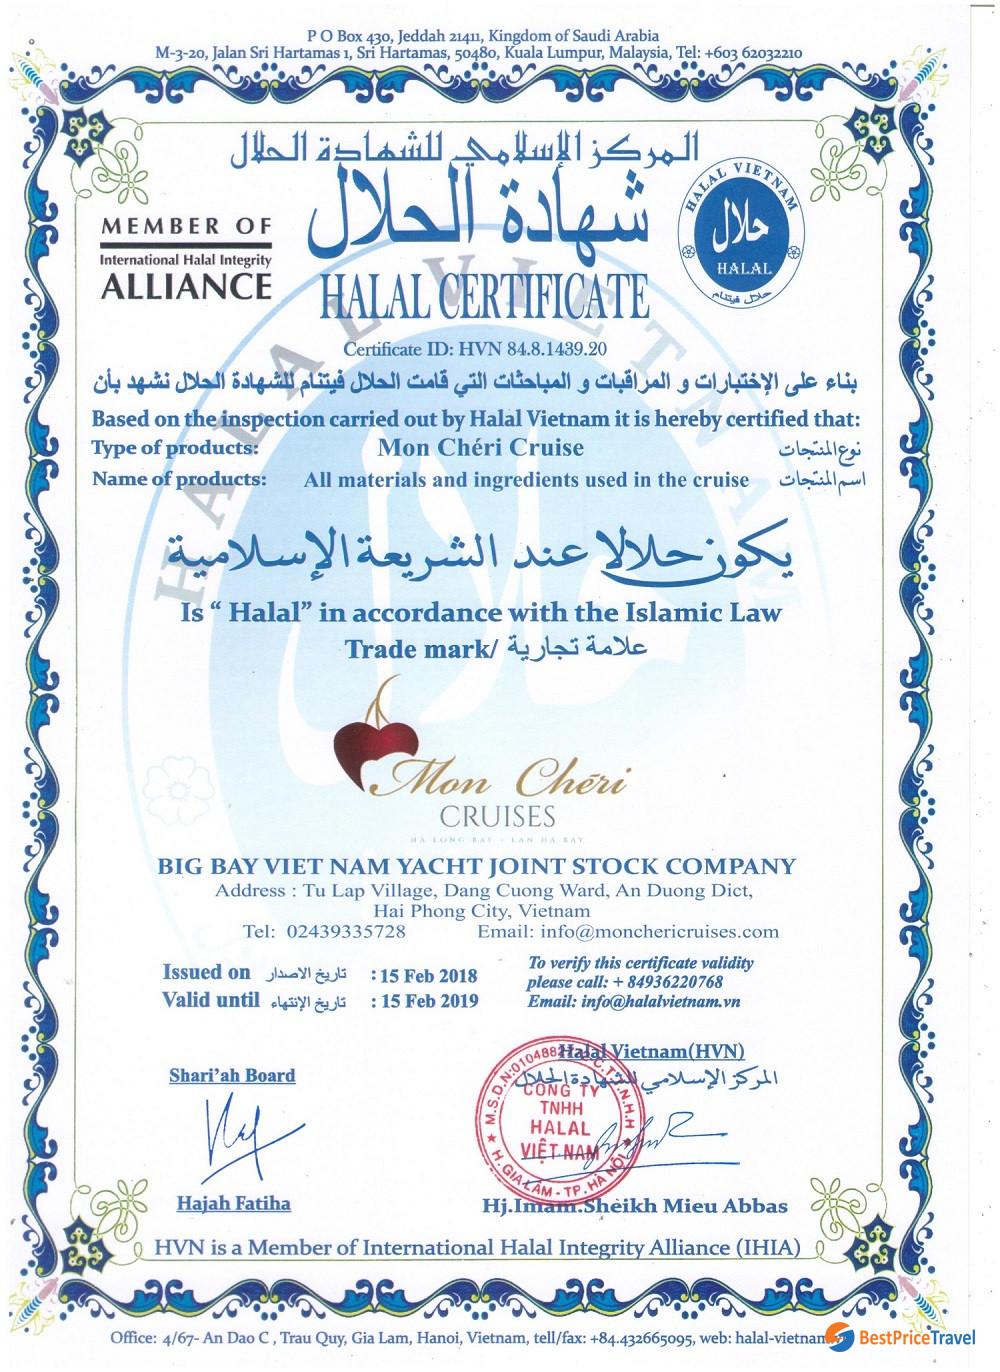 Mon Cheri Cruise's Halal Certificate